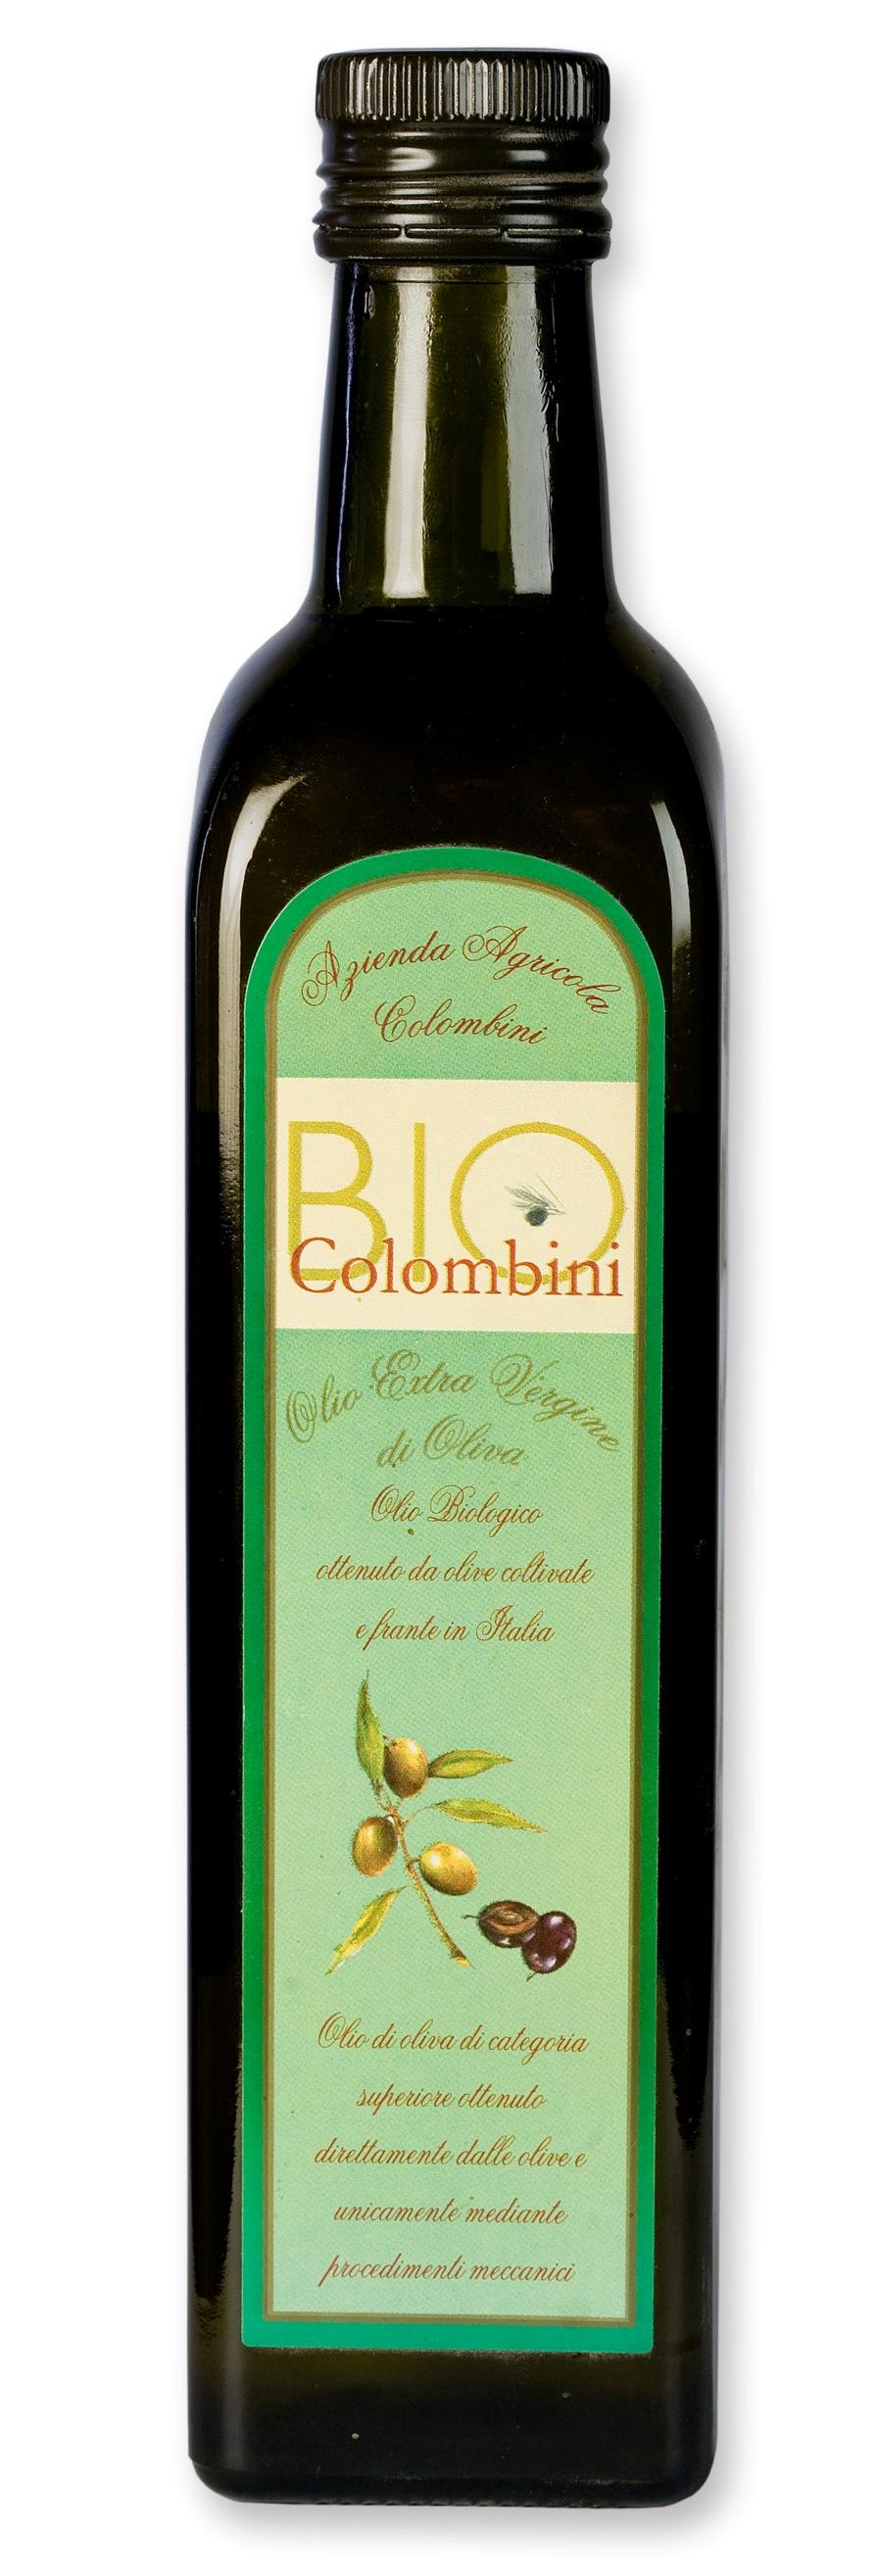 Olio Toscano Biologico BioColombini